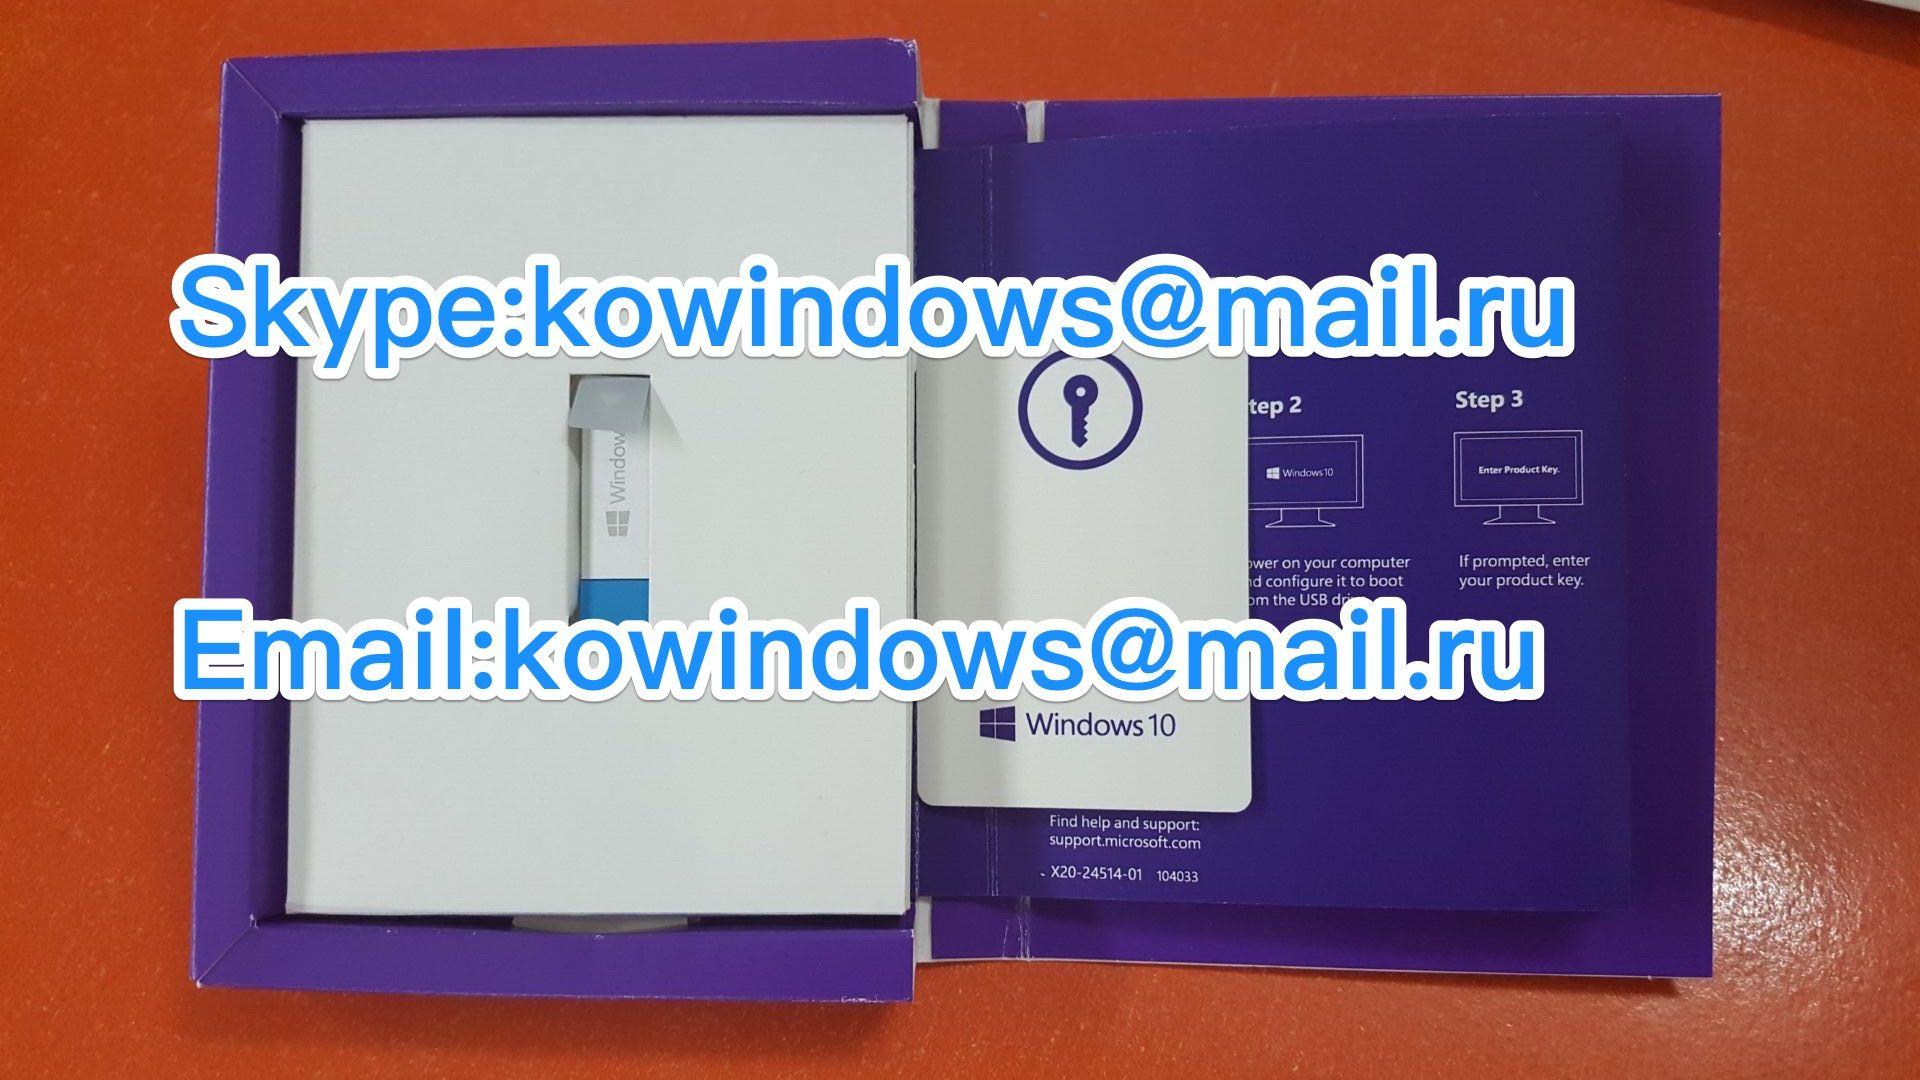 Microsoft Windows 10 Home English Usb Flash Drive: USB Flash Drive Retail Box/windows 10 Pro